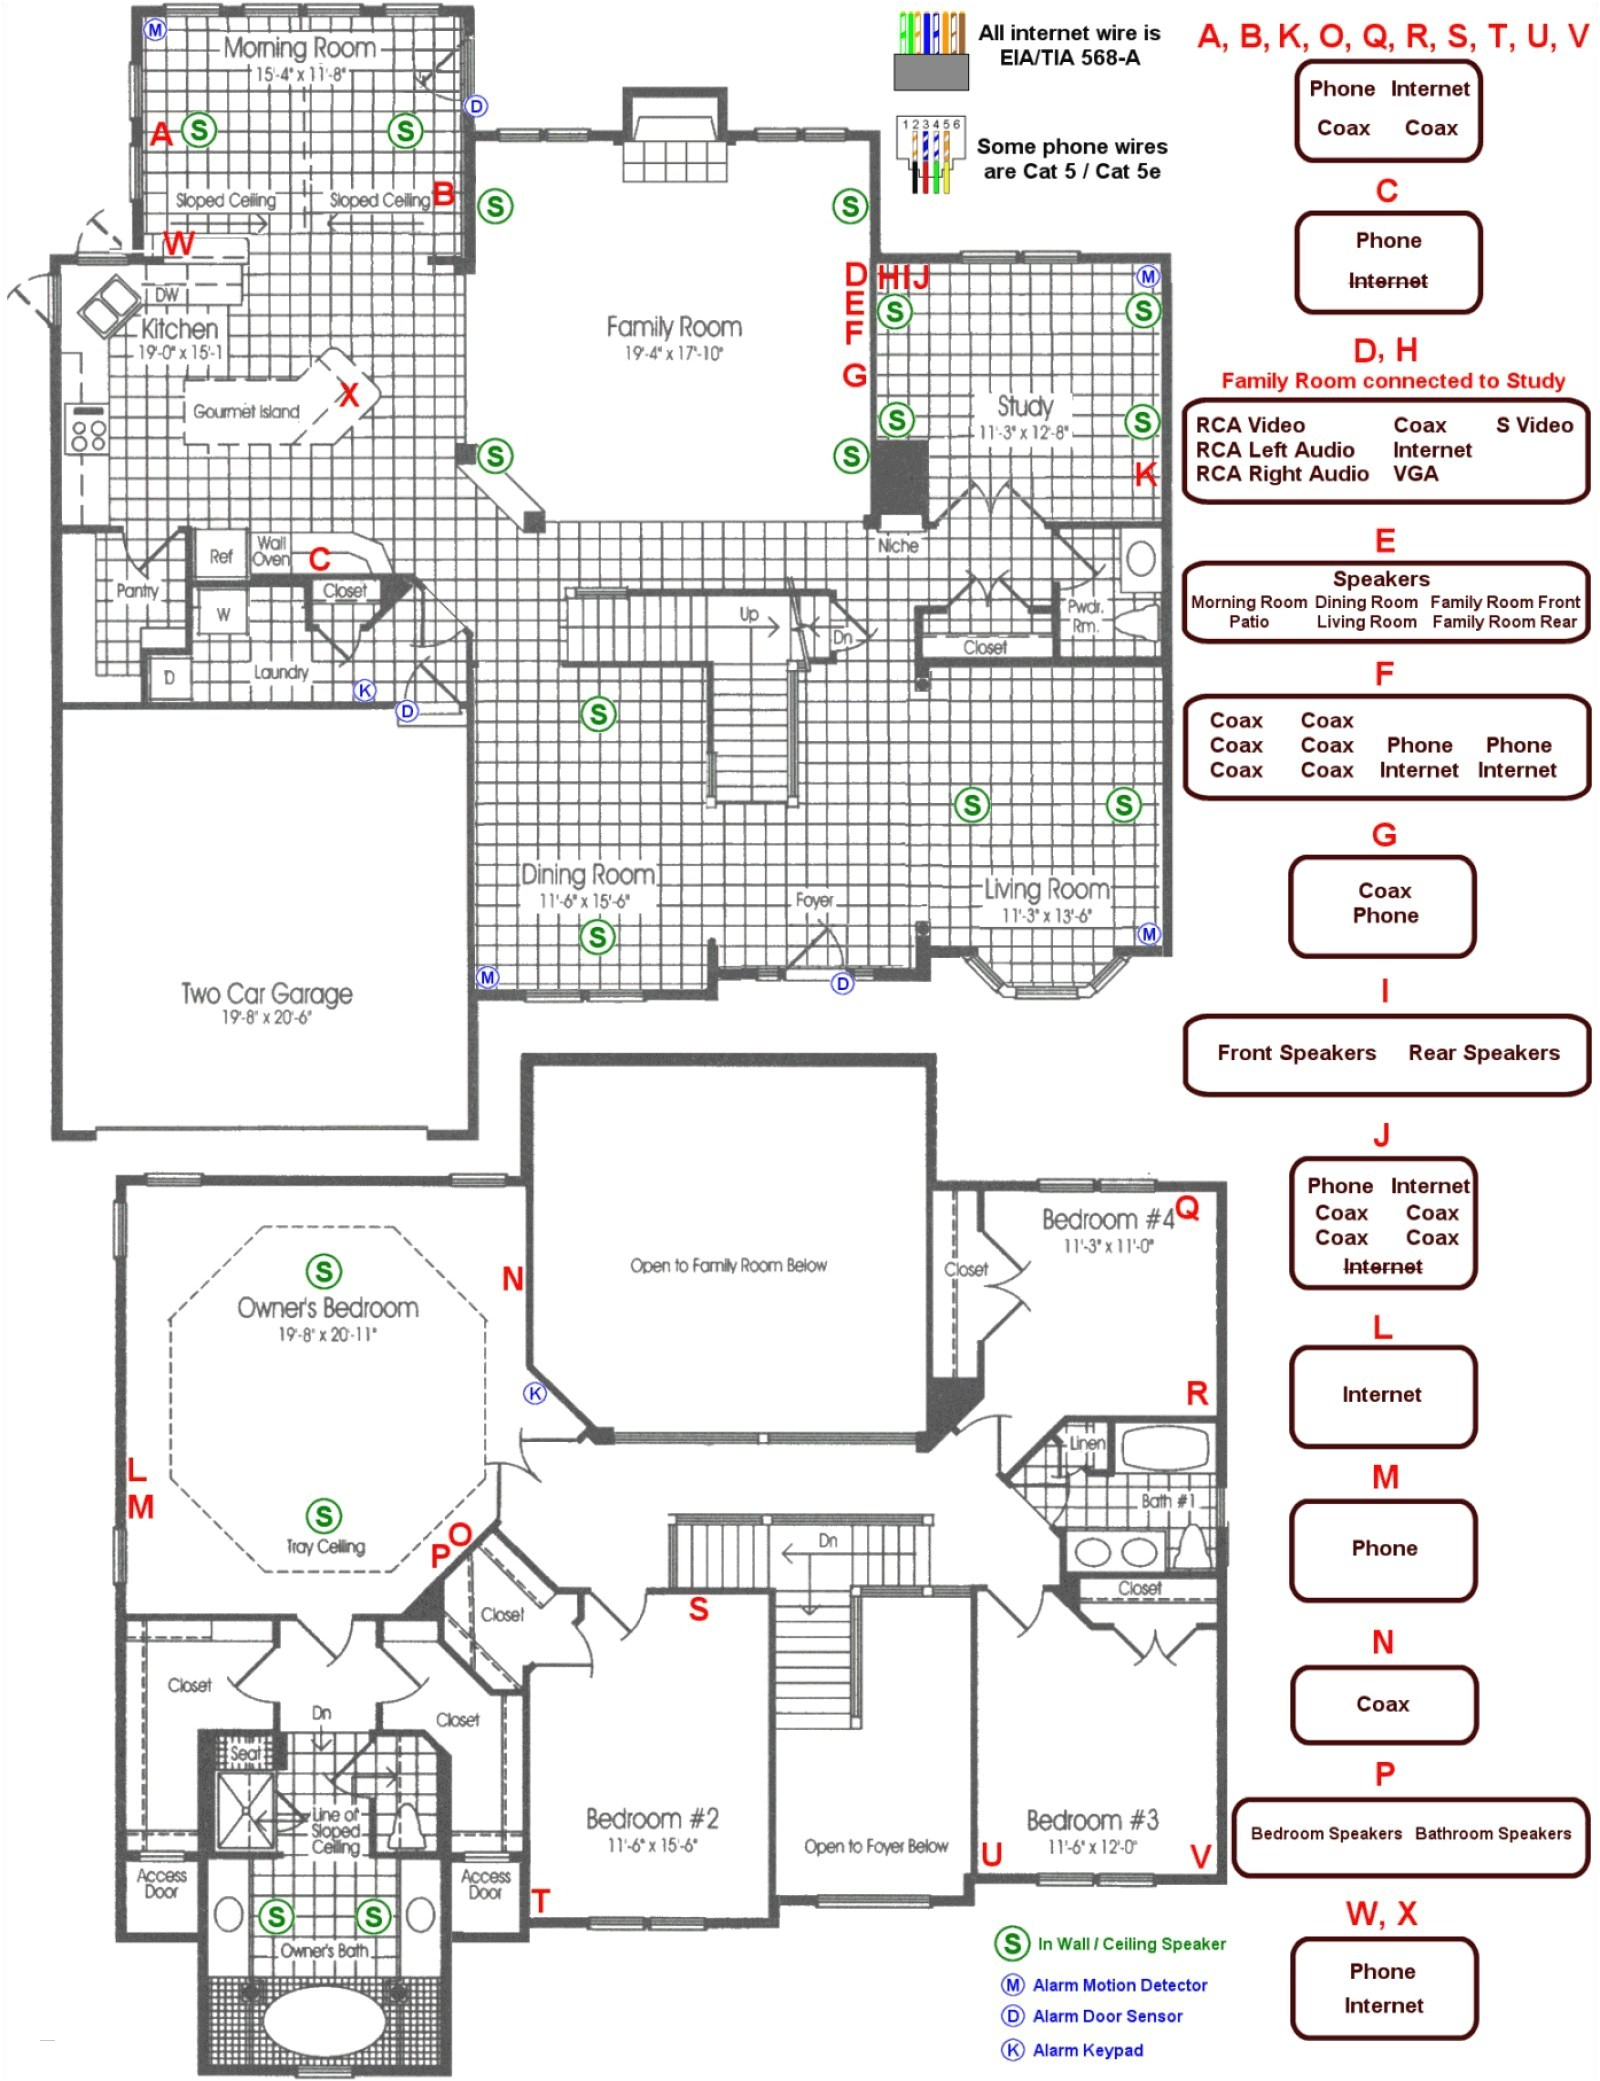 plc wiring diagram software wiring diagram to relay new supreme light switch wiring diagram 1 way creativity 0d wiring 19p jpg